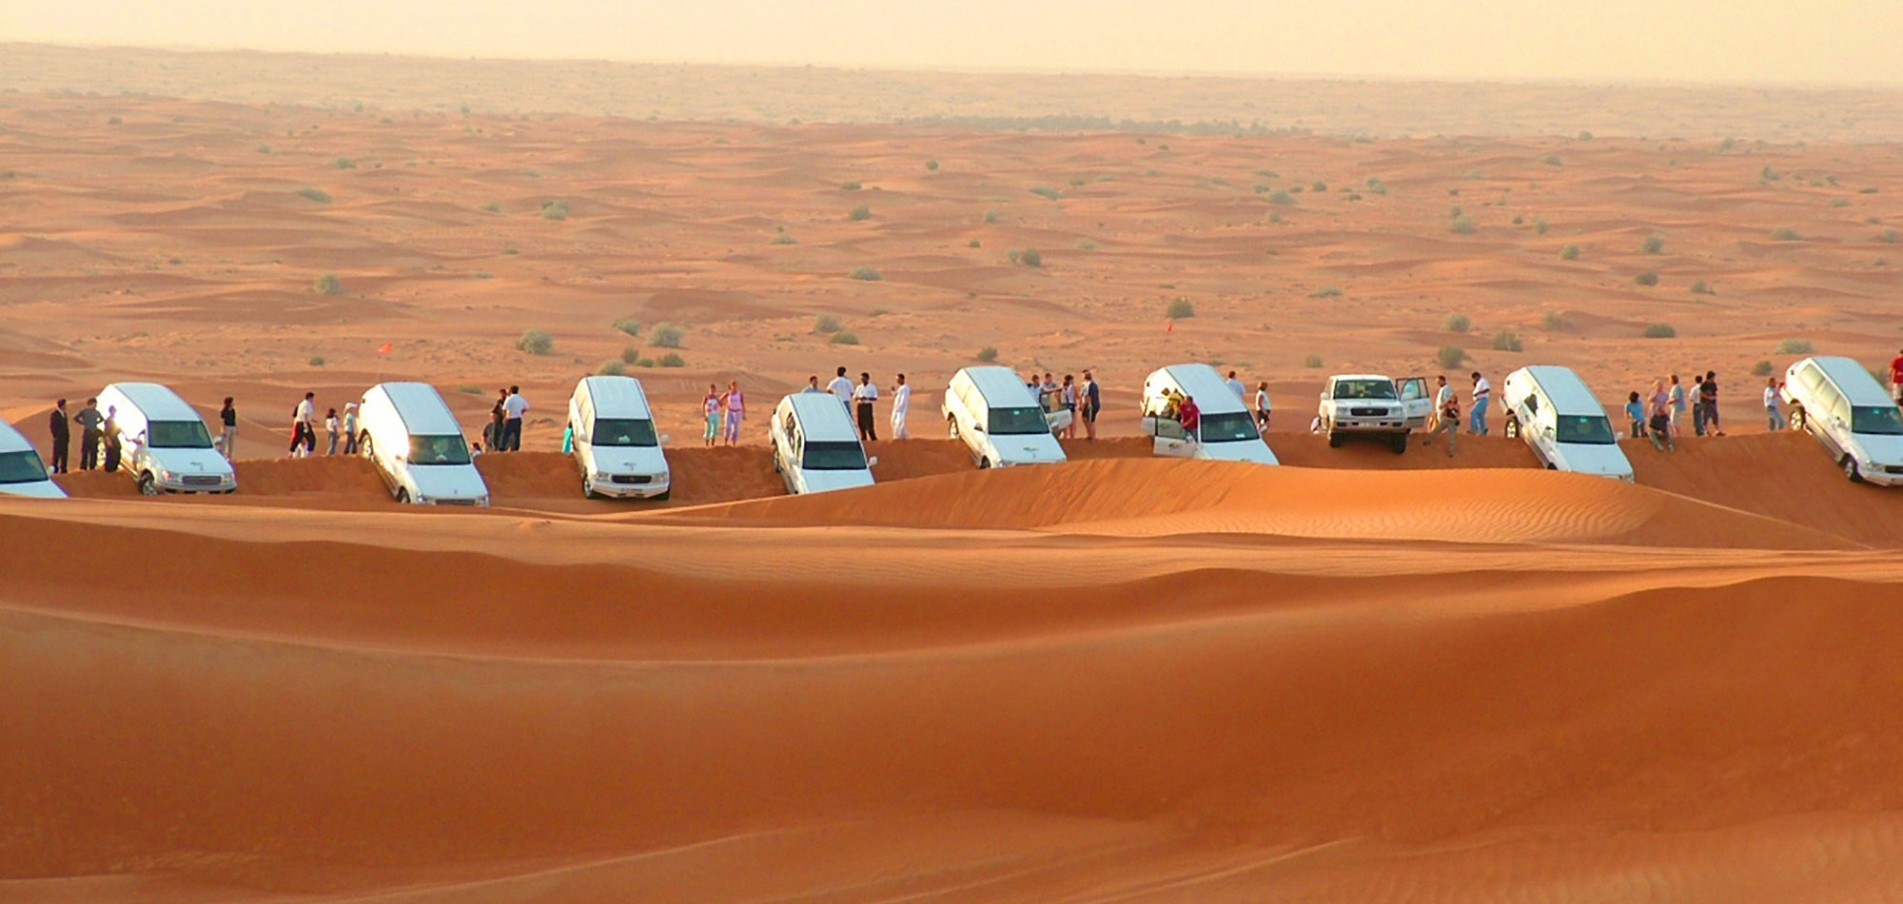 Dune Bashing Action ohne Ende – Desert Safari Dubai.